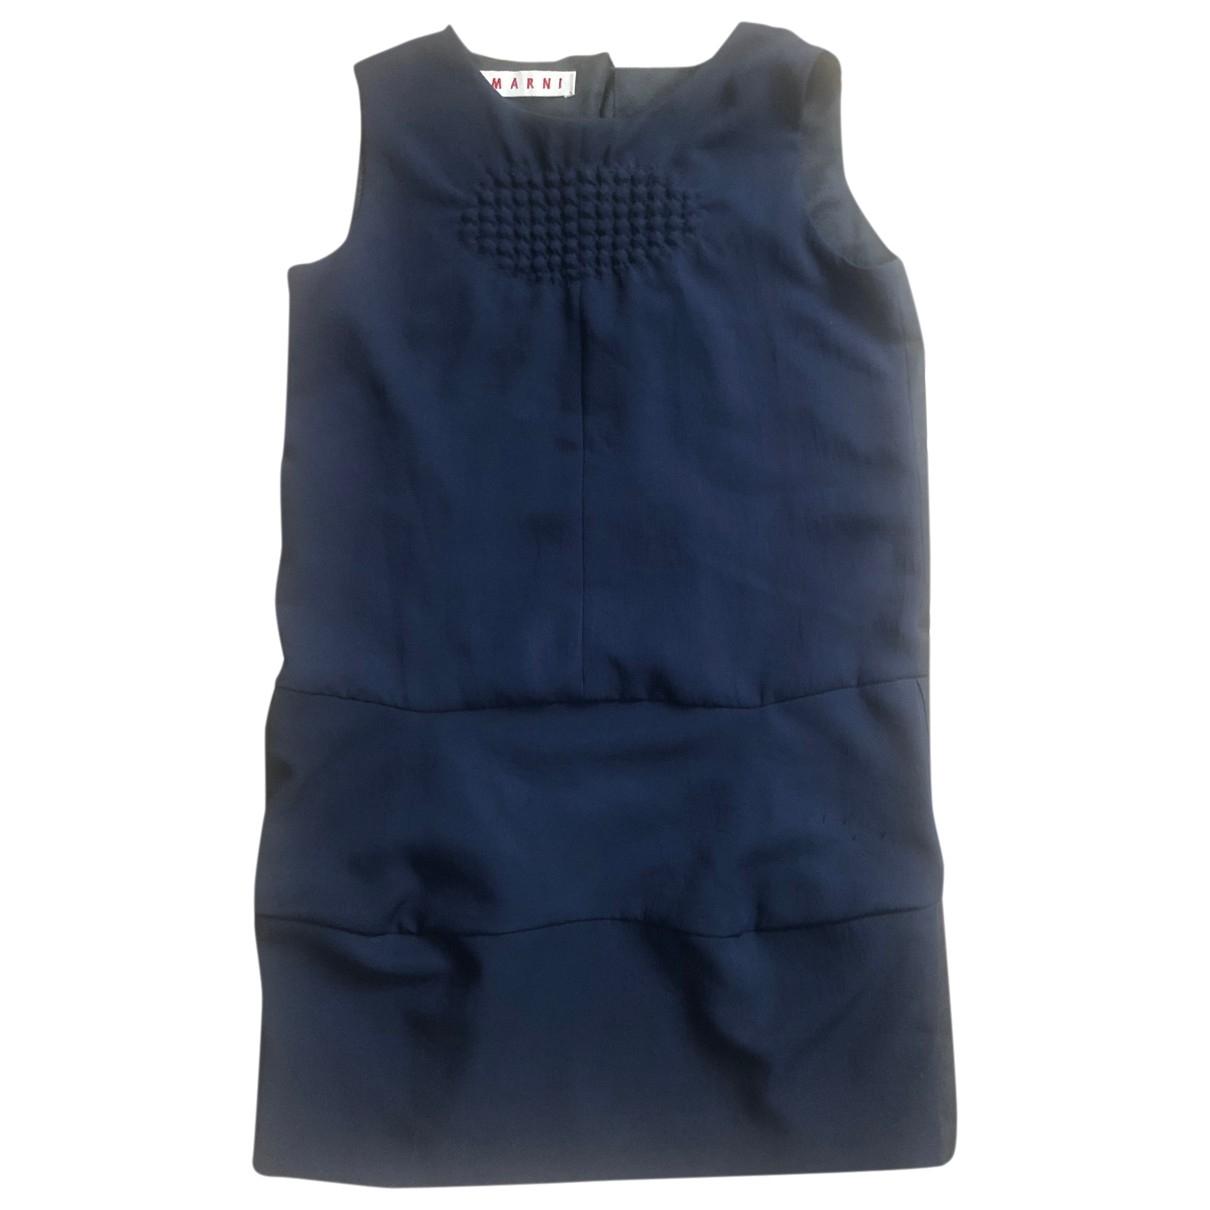 Marni \N Kleid in  Marine Polyester